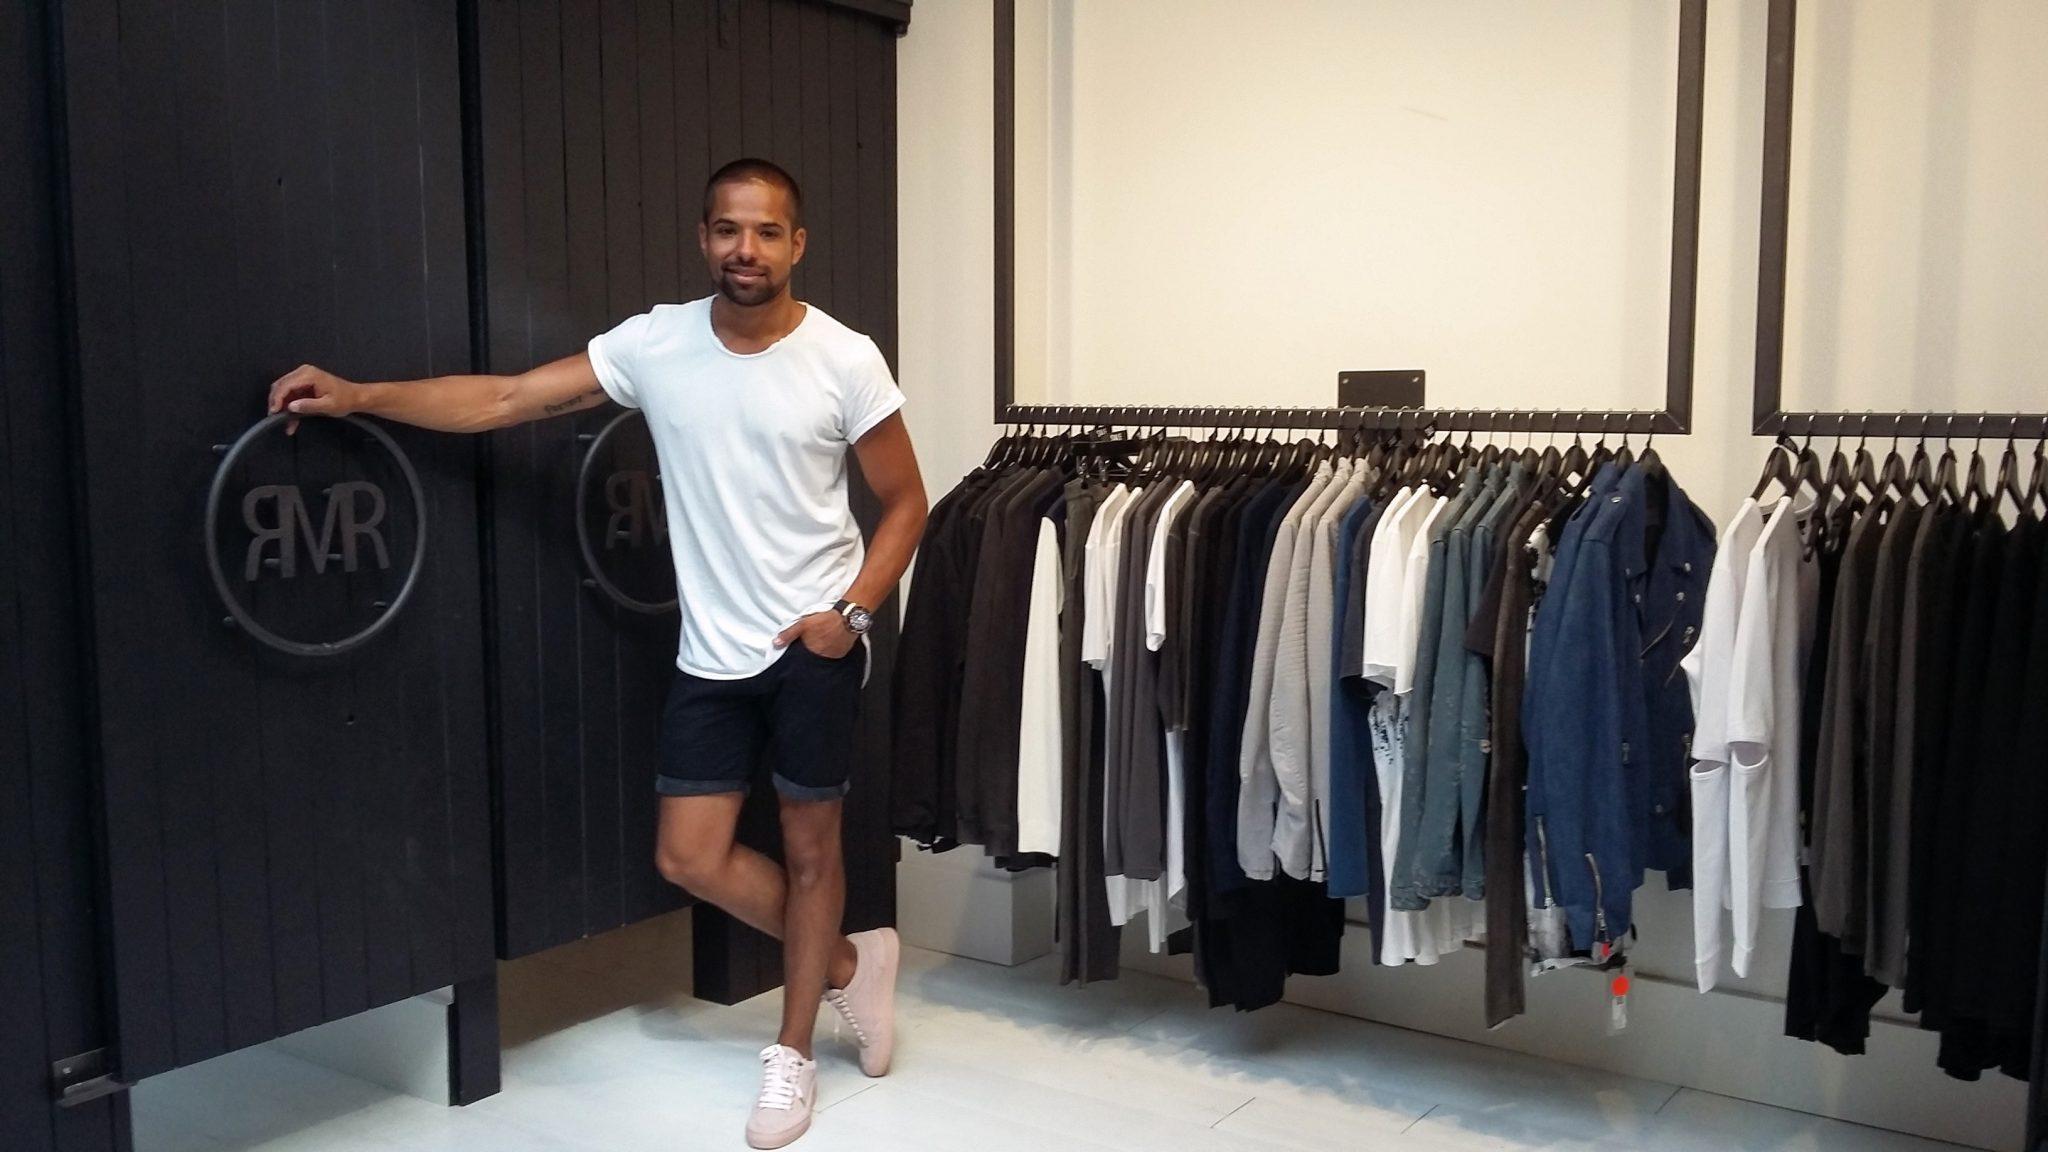 Marcel Rocha van Dinmar Fashionstore